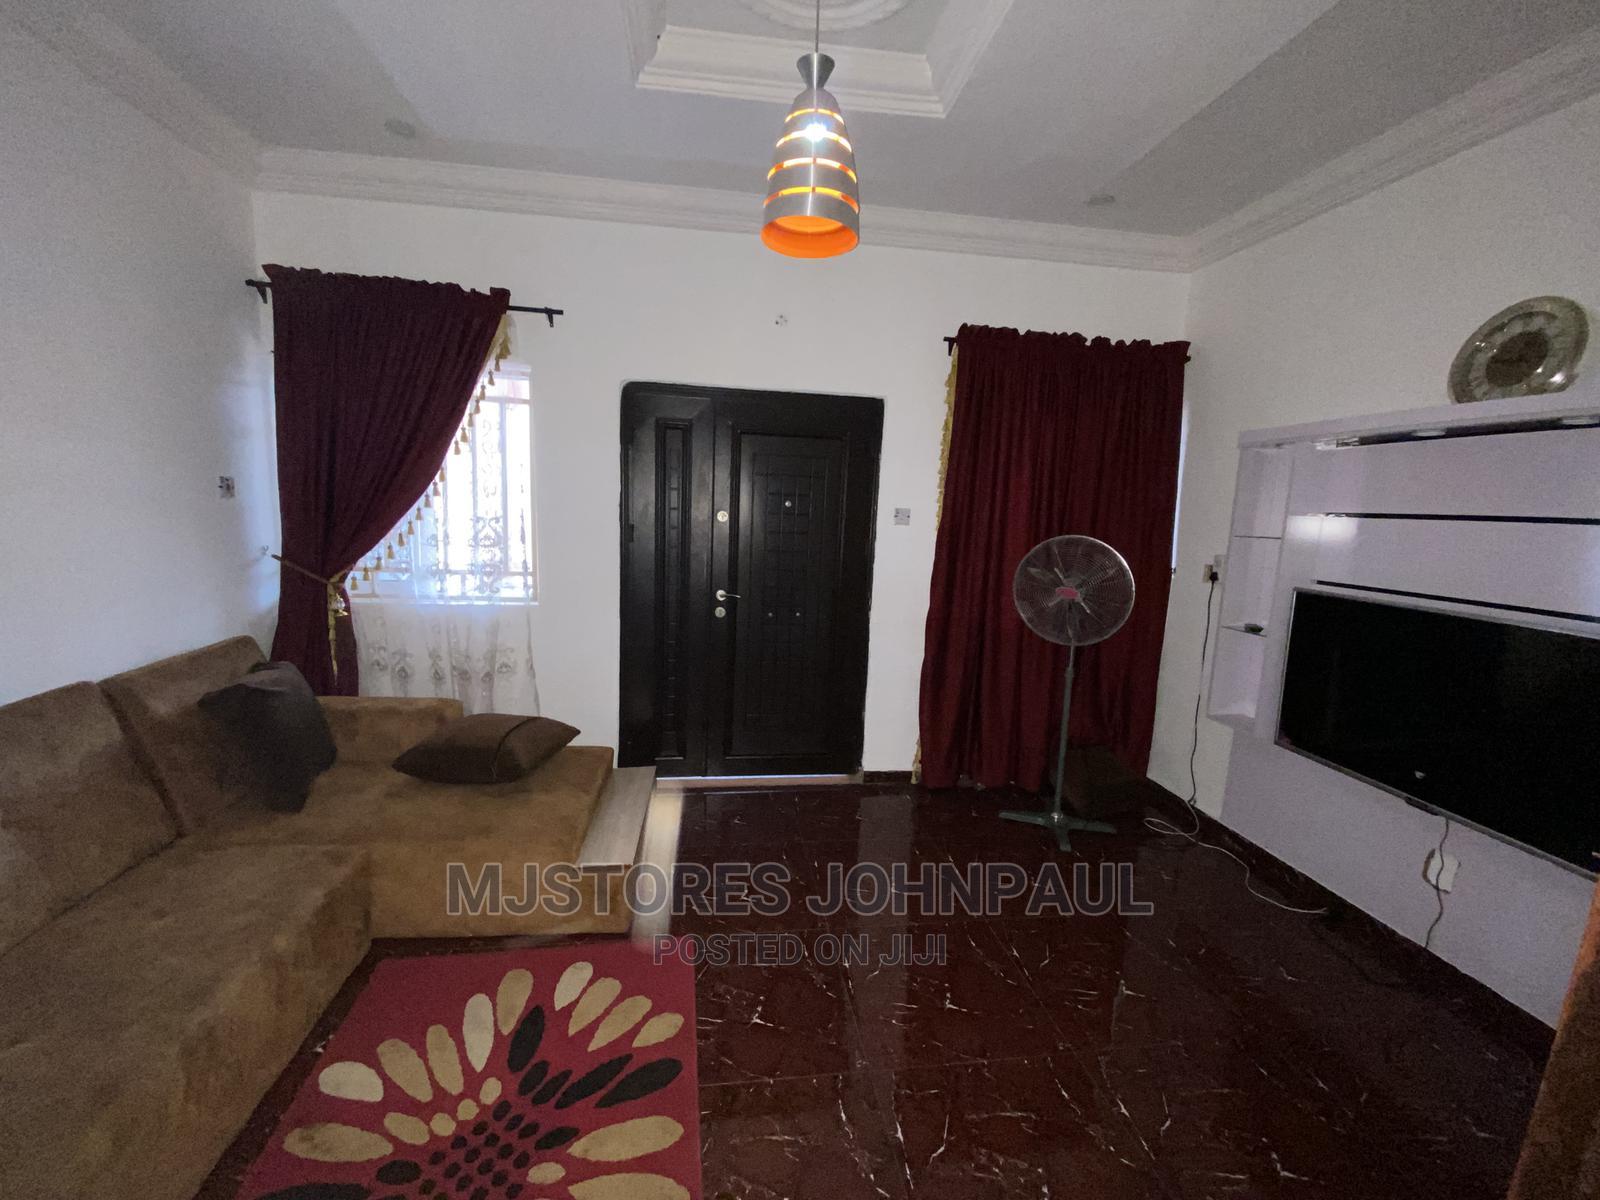 4 Bedroom Fully Furnished and Serviced Apartment   Short Let for sale in Enugu, Enugu State, Nigeria